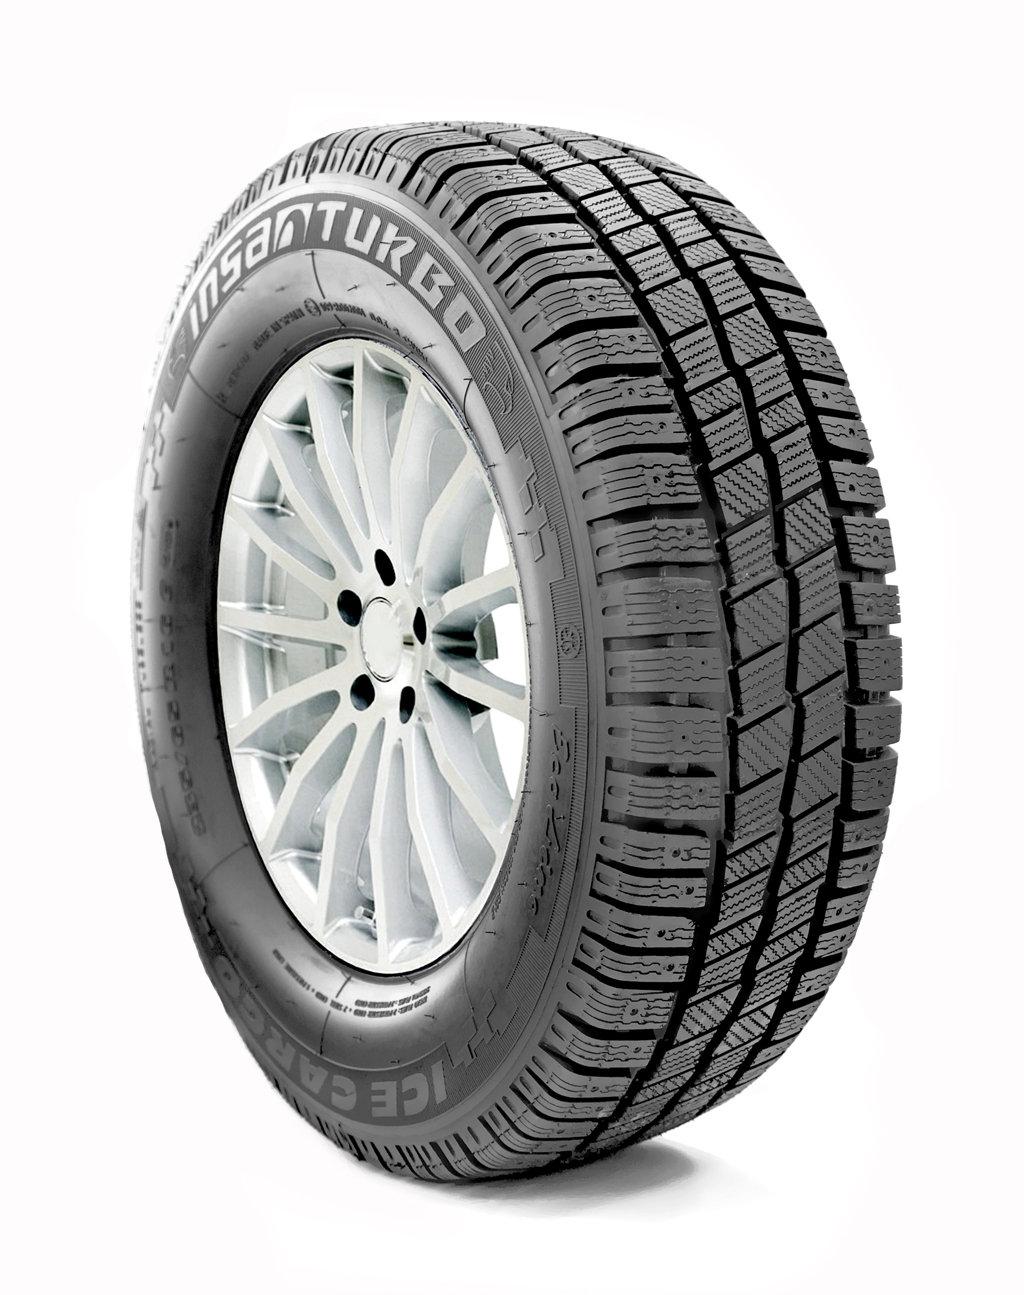 Neumático BCT S600 175/65R14 86 T